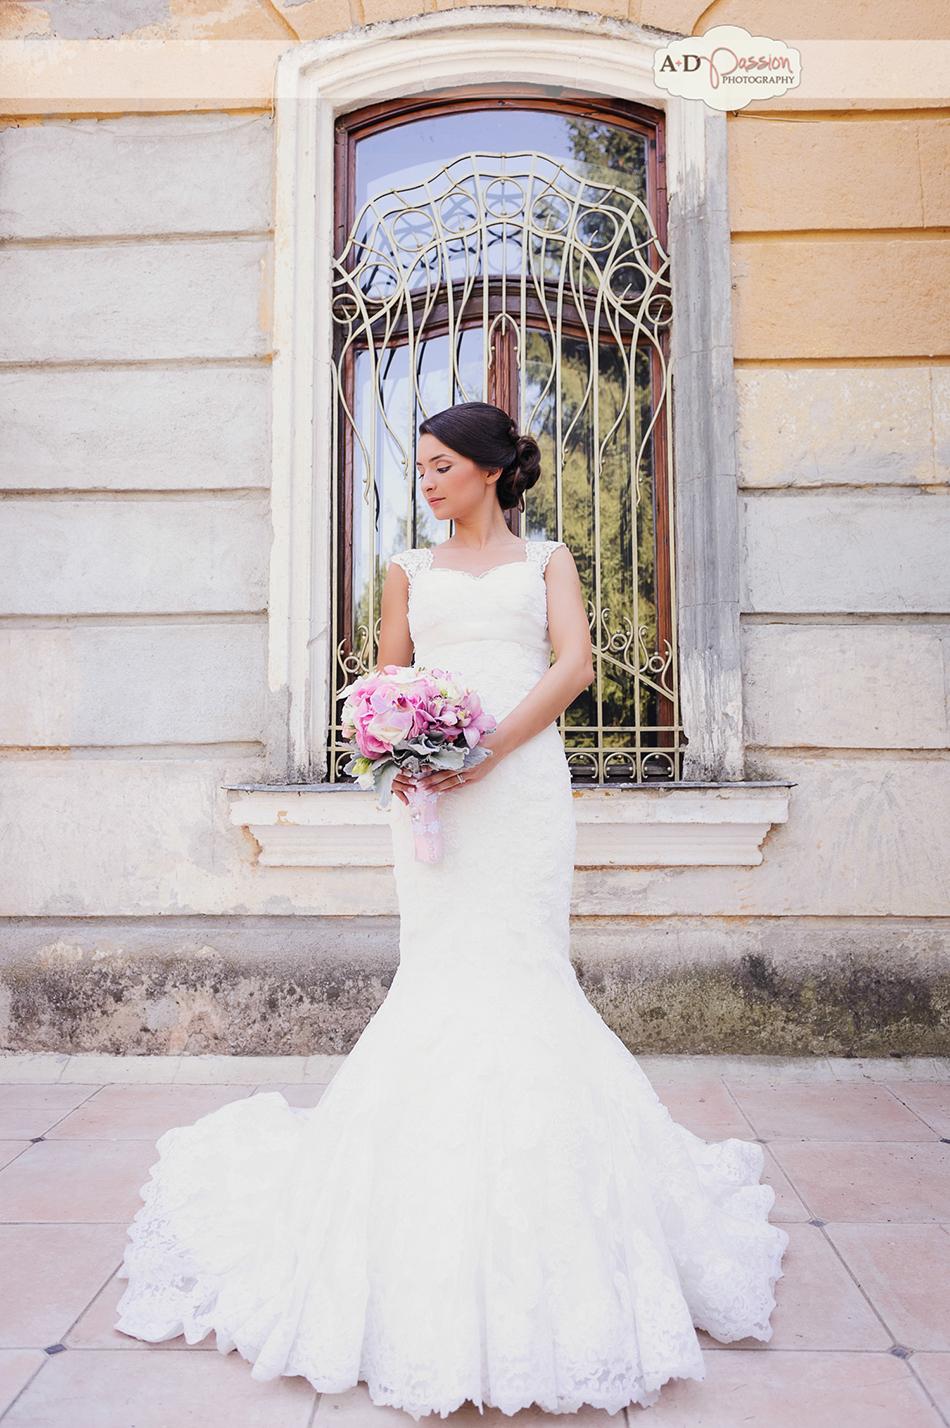 AD Passion Photography | 20130804_ana+calin_fotografie-vintage_fotograf-nunta-oradea_fotograf-profesionist_0073 | Adelin, Dida, fotograf profesionist, fotograf de nunta, fotografie de nunta, fotograf Timisoara, fotograf Craiova, fotograf Bucuresti, fotograf Arad, nunta Timisoara, nunta Arad, nunta Bucuresti, nunta Craiova